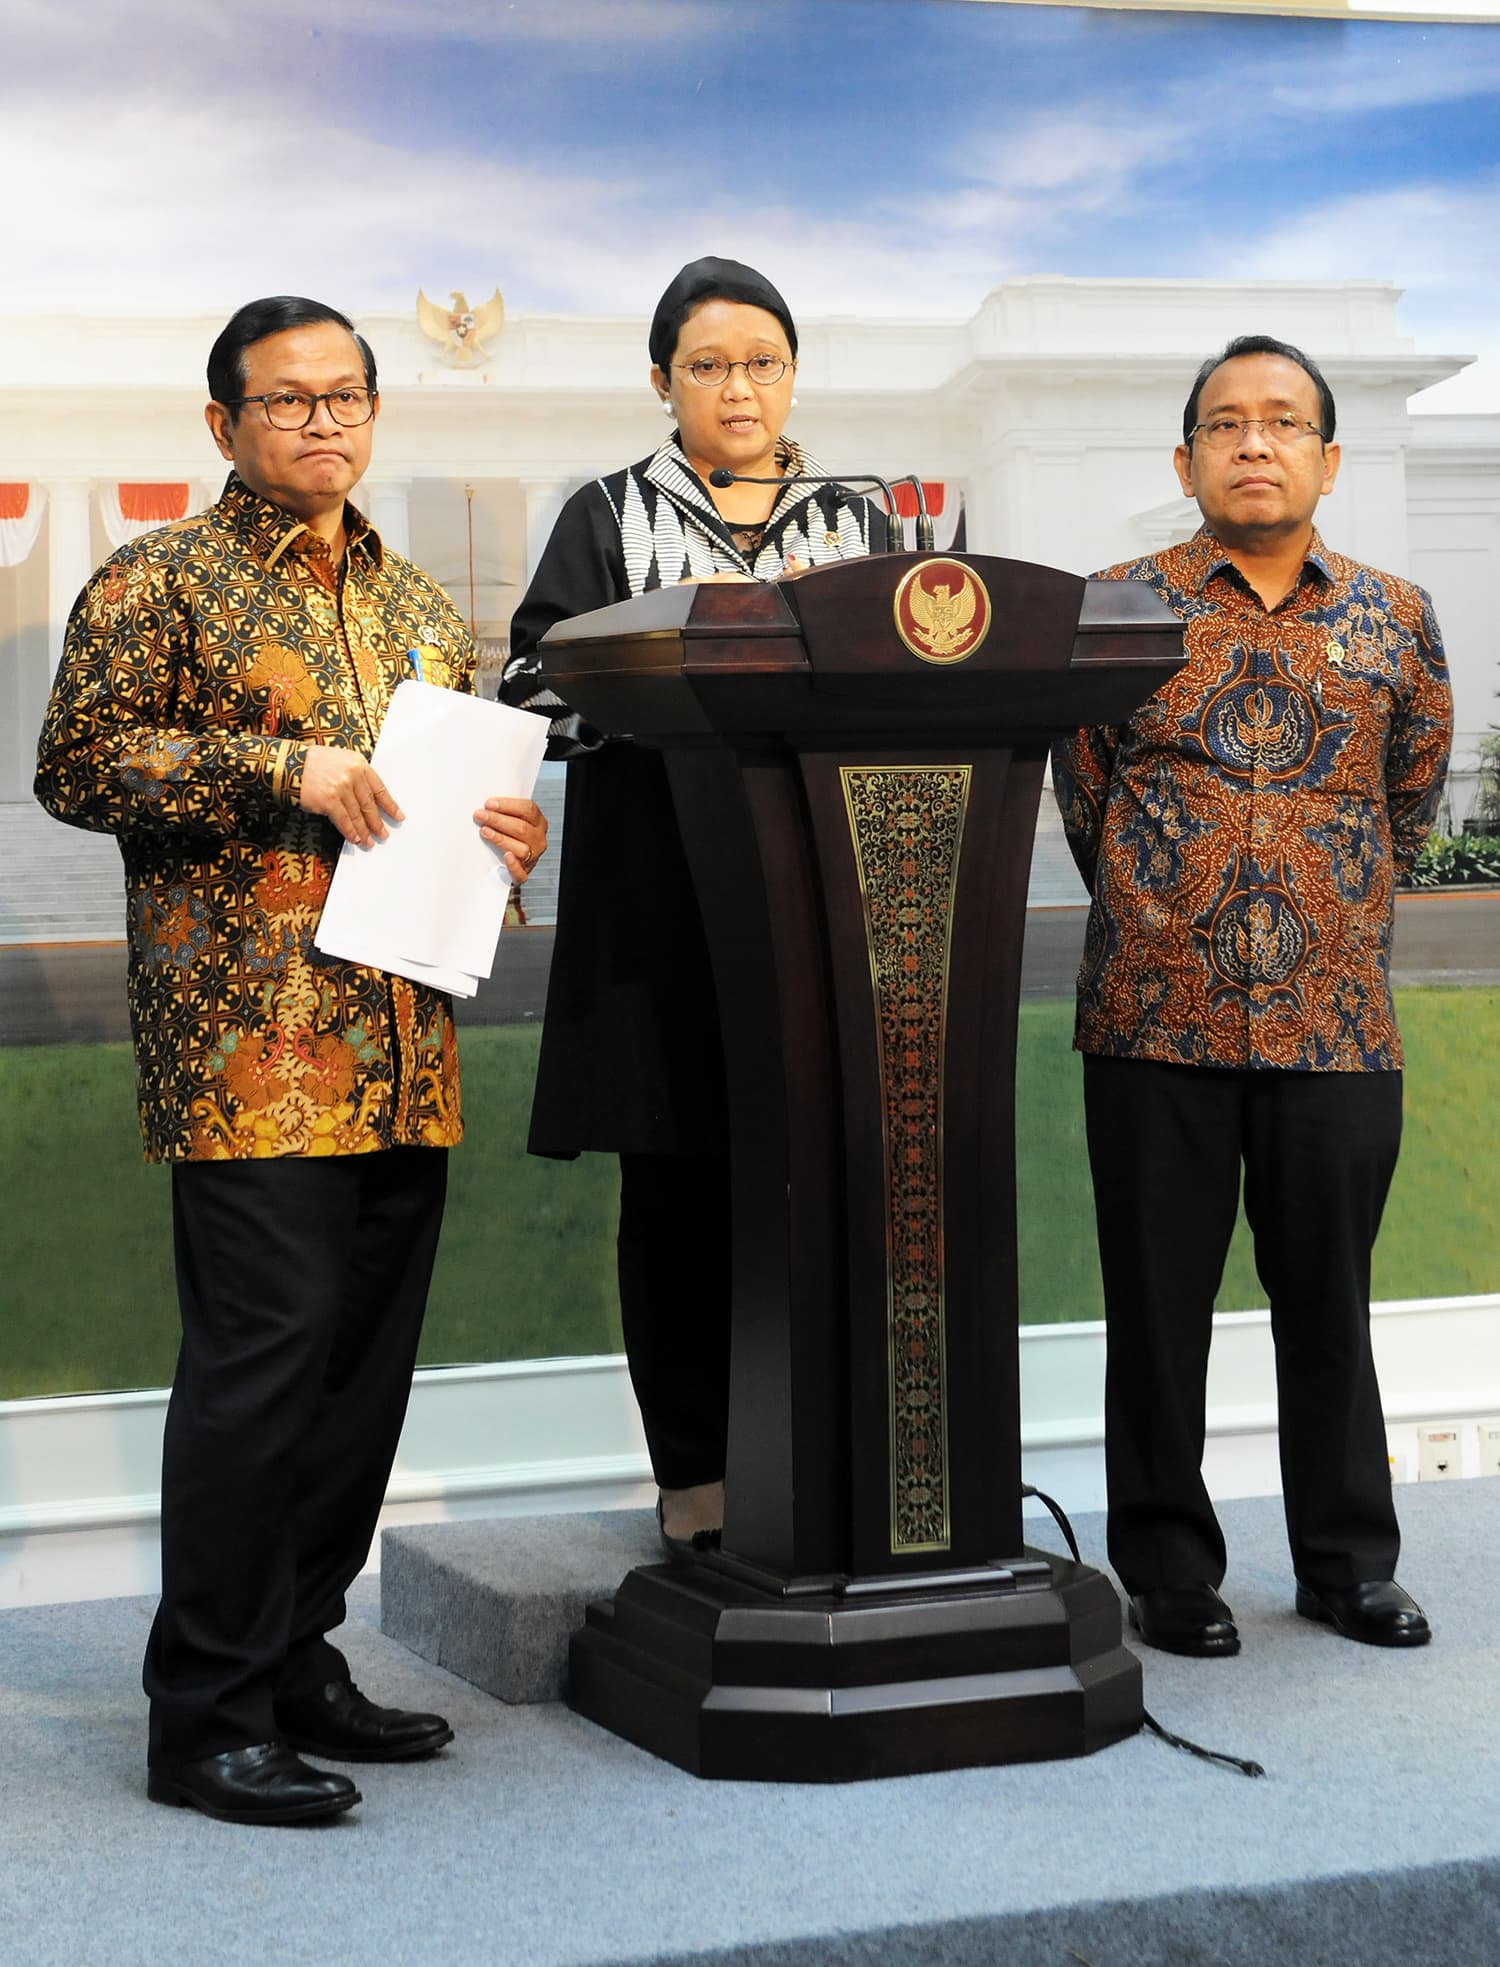 Menlu usai Rapat Terbatas memberikan keterangan mengenai persiapan IORA di Kantor Presiden Jakarta (2/3). (foto: Humas Nia)